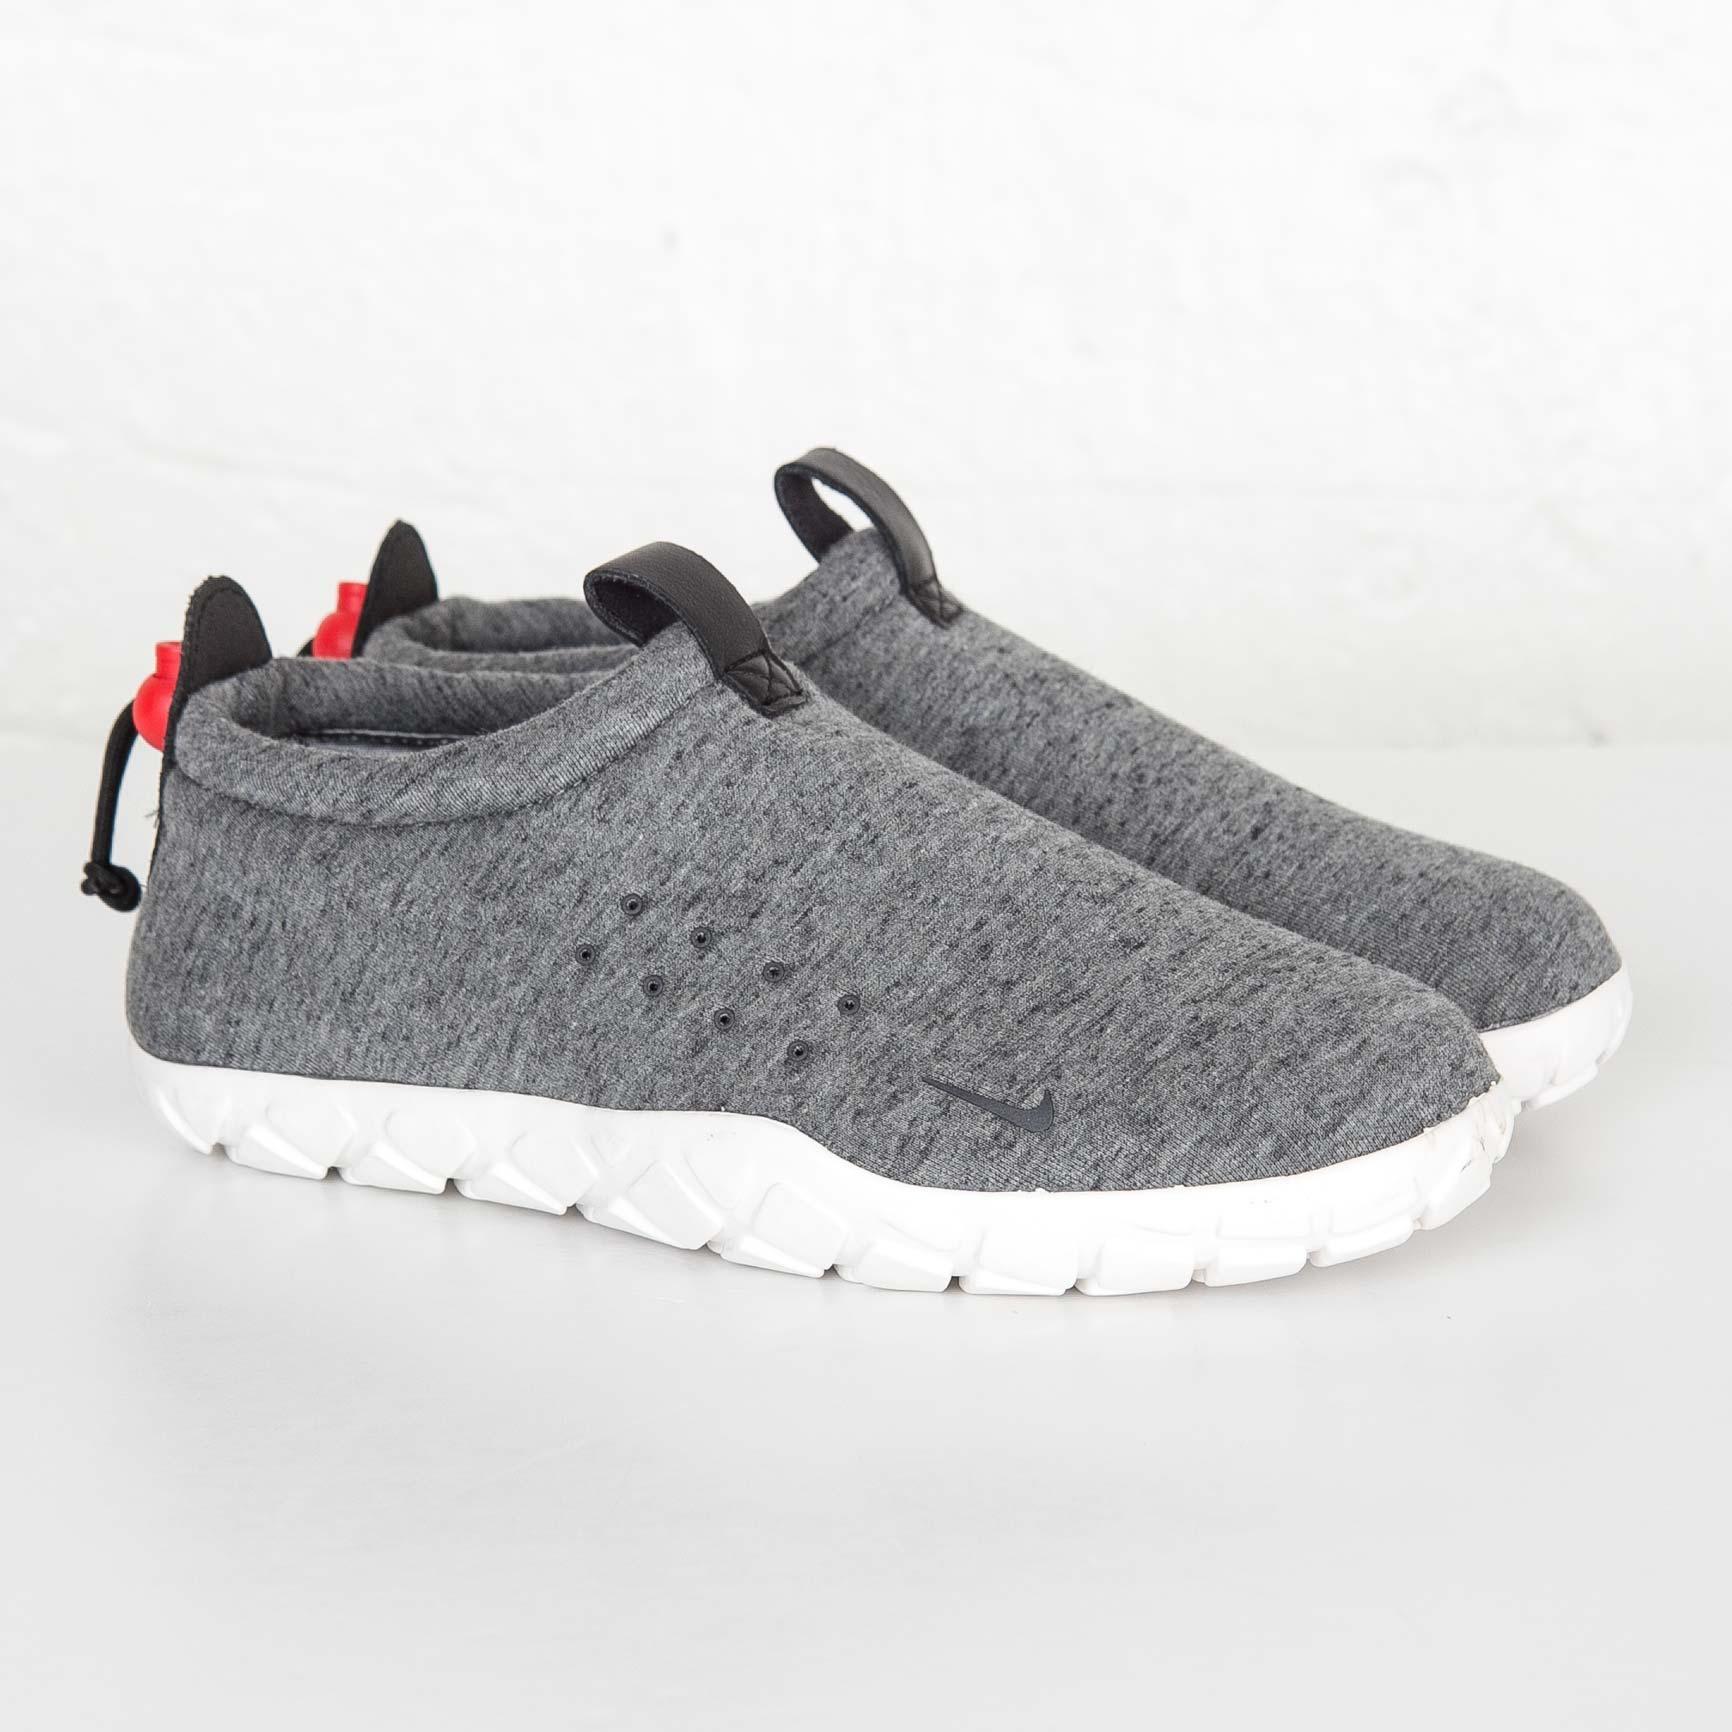 Nike Air Moc TechFleece - 834591-001 - Sneakersnstuff  cffbbba939